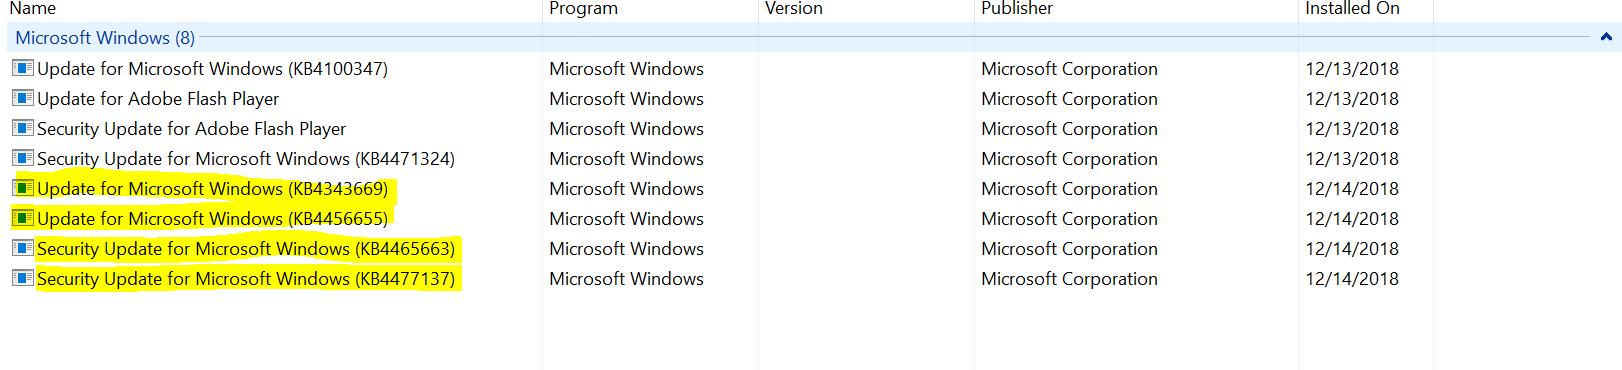 VMware SSL VPN-Plus Client issue after November Updates for Windows 10